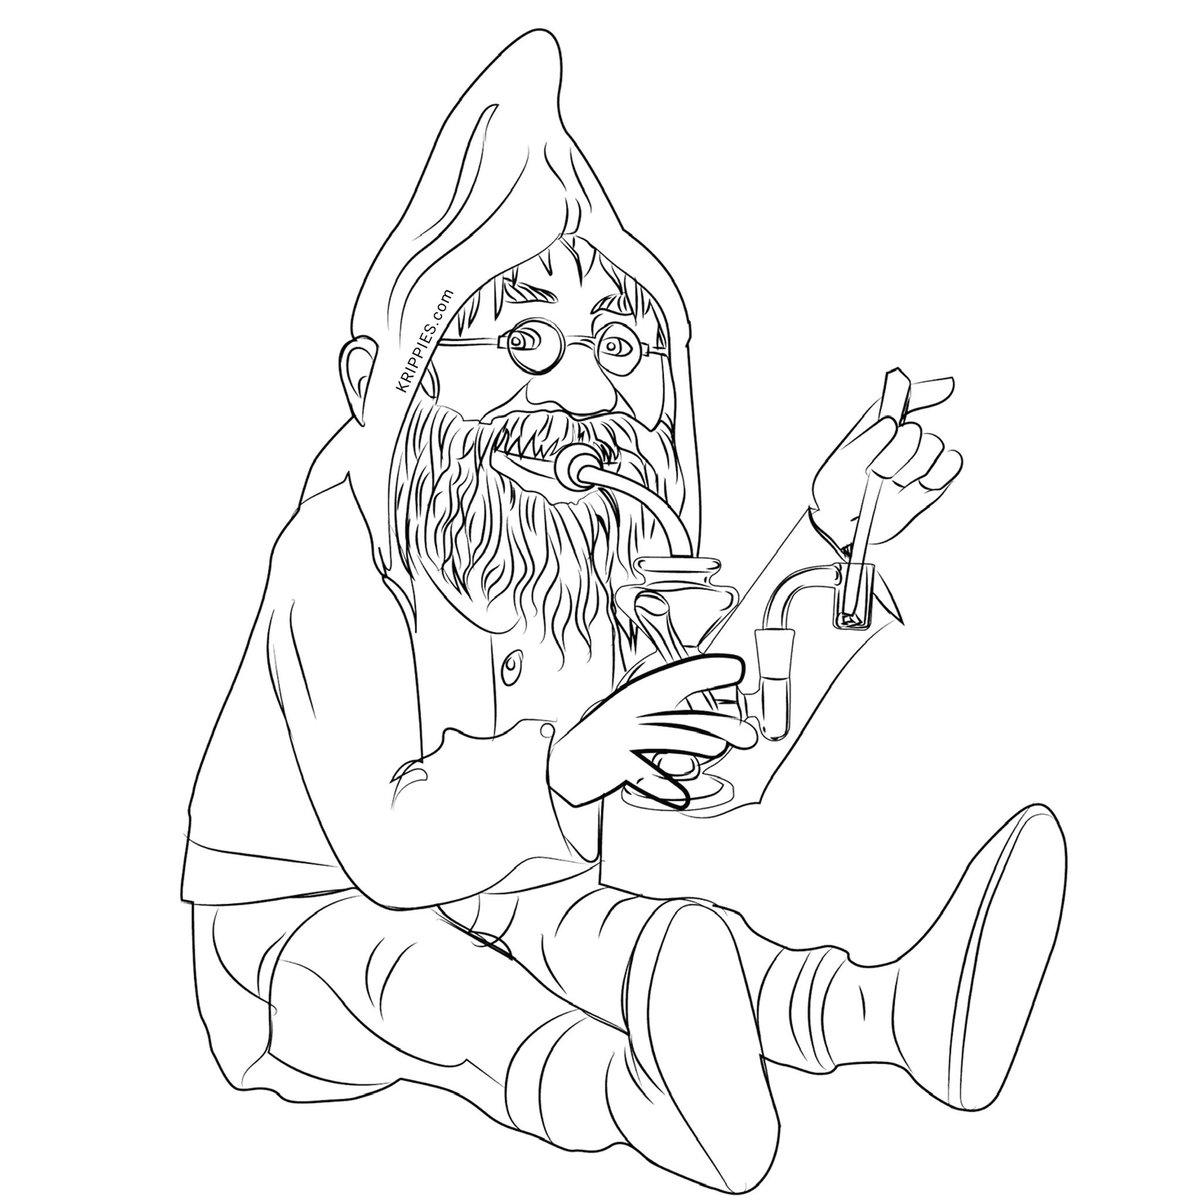 Gnome Dabs!  Happy Pre #710dabday   #hightimes #dabrig #marijuana #cannabiscommunity #dabs #weedporn #glassofig #dabbersdaily #thca #thc #710community #cannabis #stoner #dabdaily #dabstagram #710 #dab #cbd #cannabisculture #420pic.twitter.com/BNajClad55